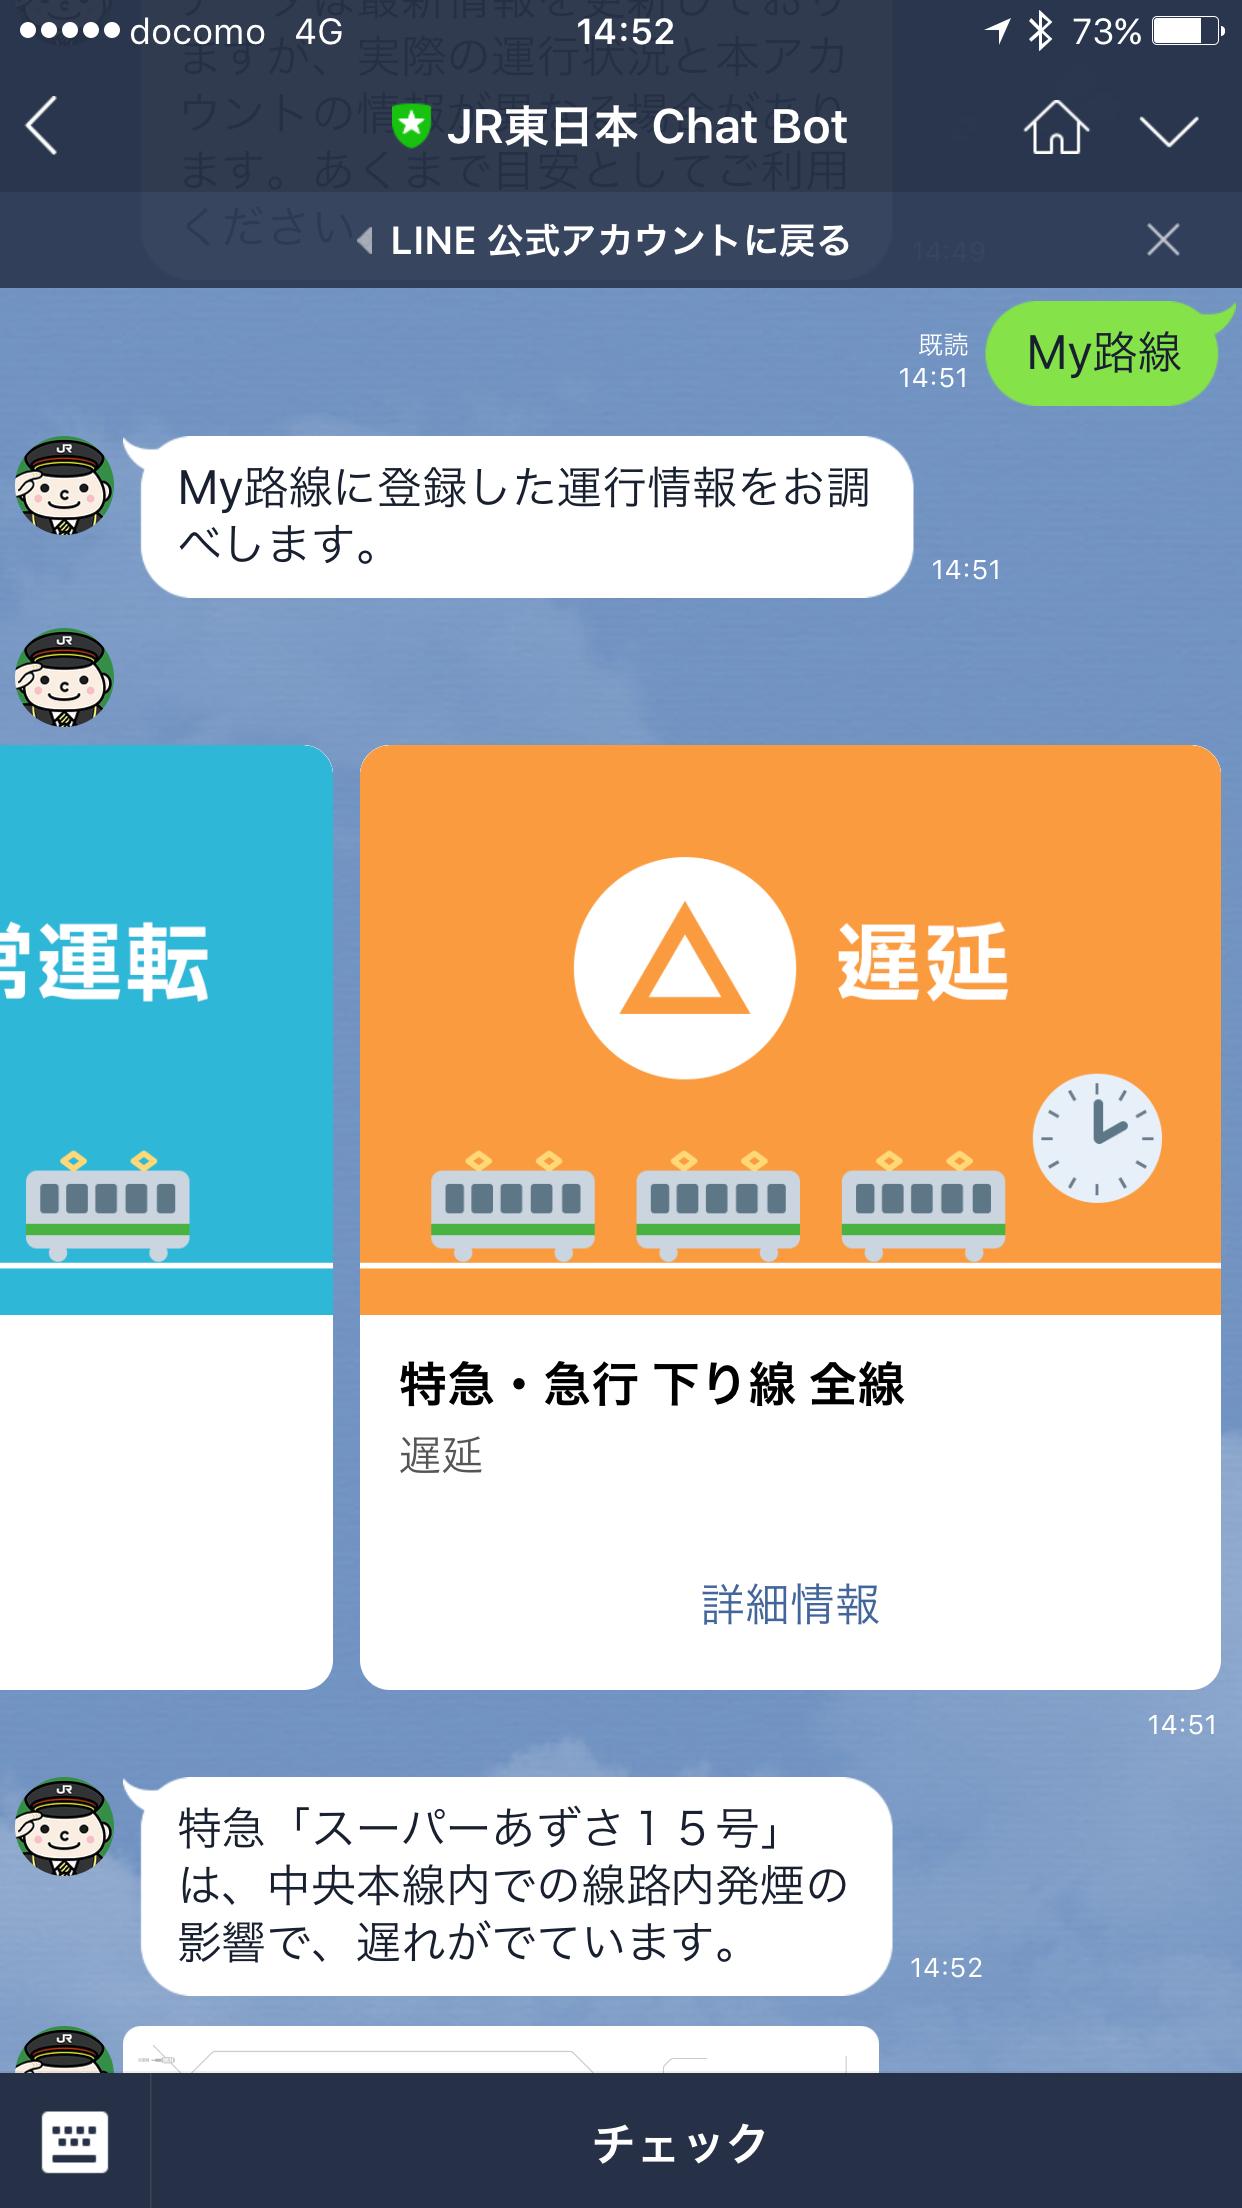 kosukety blogJR東日本がLINEチャットボットで情報提供開始(実証実験)Feedlyで新着記事をチェックしよう!ブログをメールで購読kosukety blogについてプロフィール